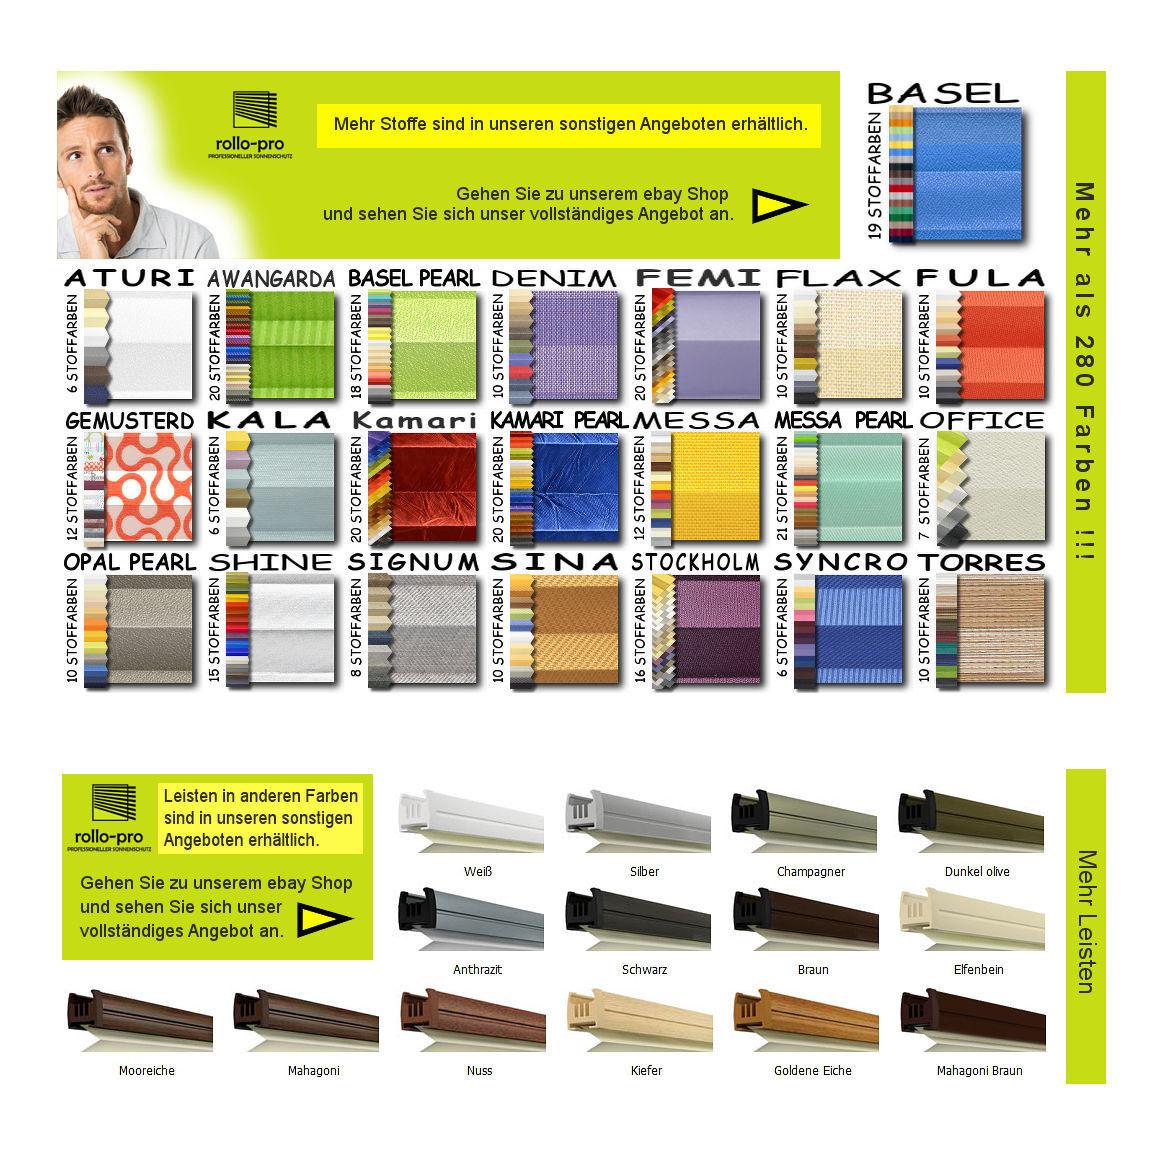 Plissee Faltrollo nach Maß Faltstore Faltstore Faltstore ohne Bohren Klemmfix DENIM Profil Mooreiche 71124c